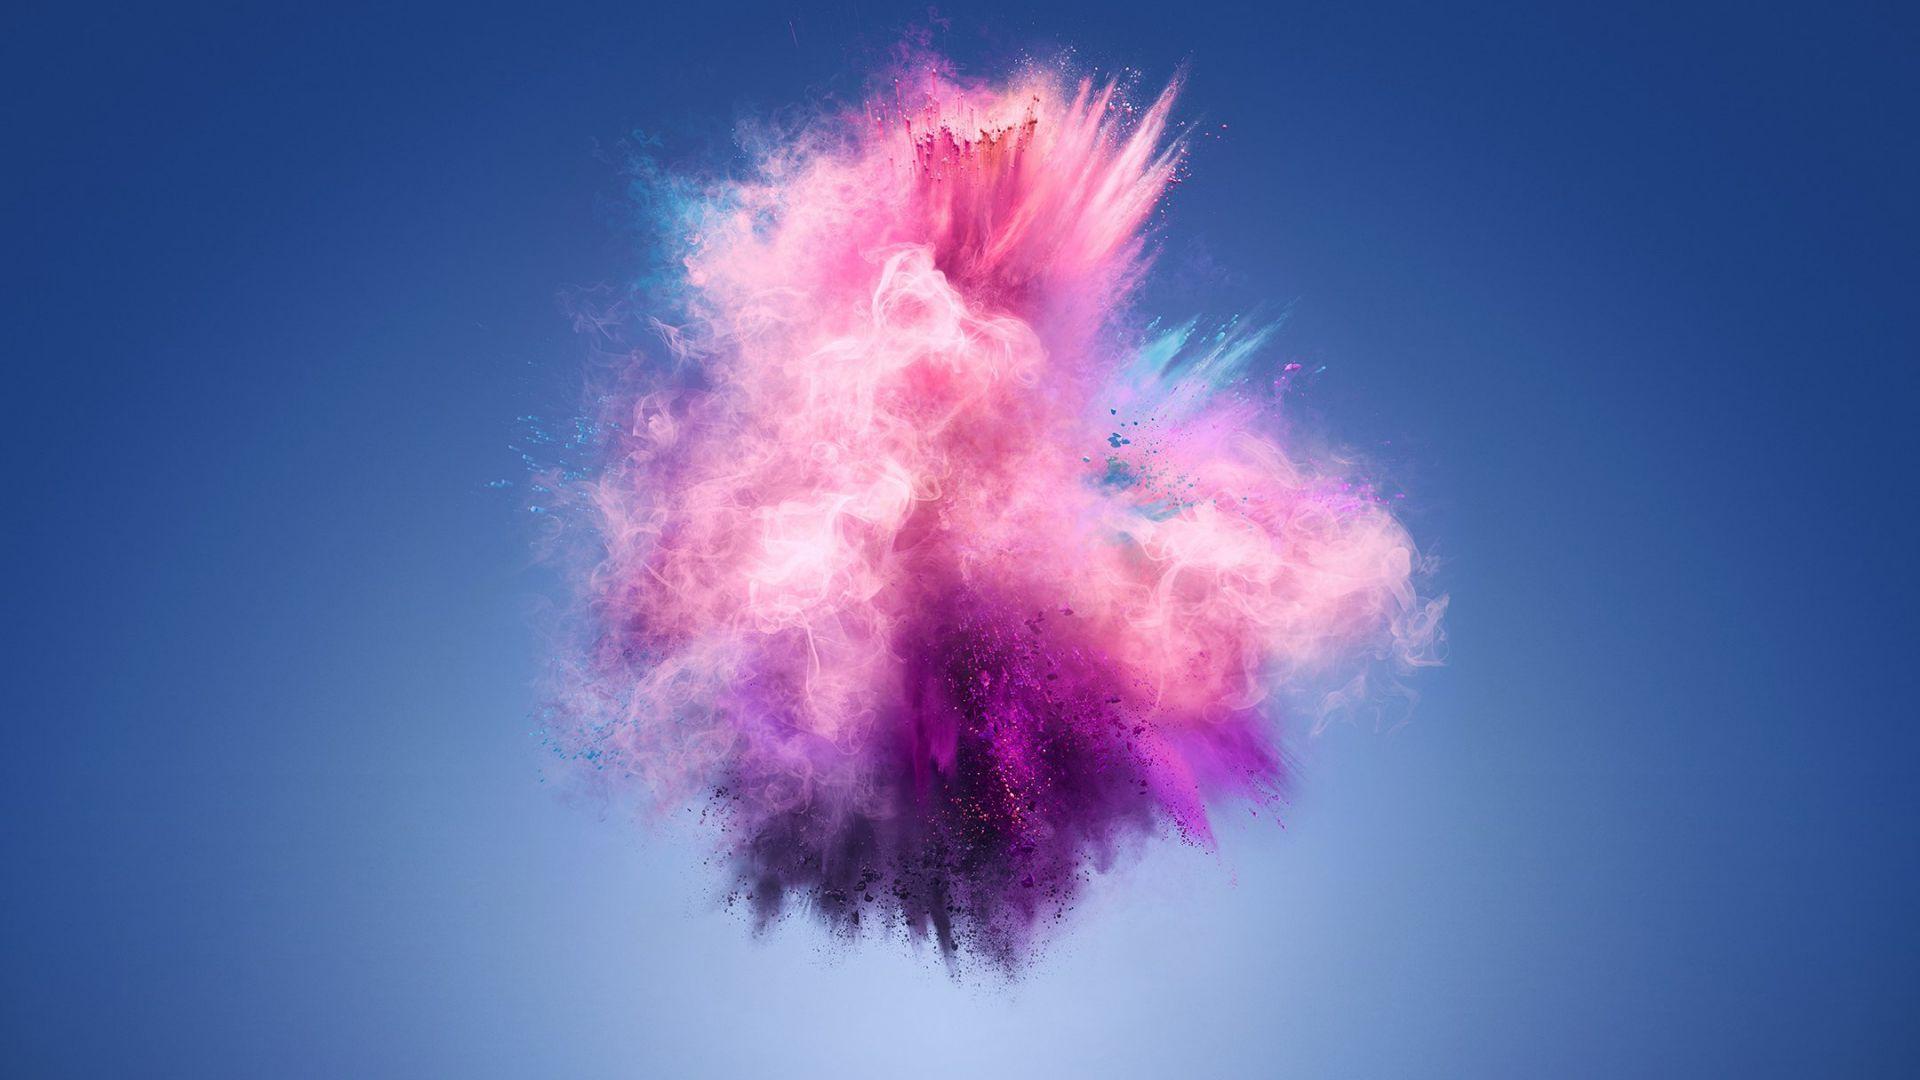 Huawei Laptop Wallpapers: Desktop Wallpaper Color Splash, Explosion, Huawei 7s